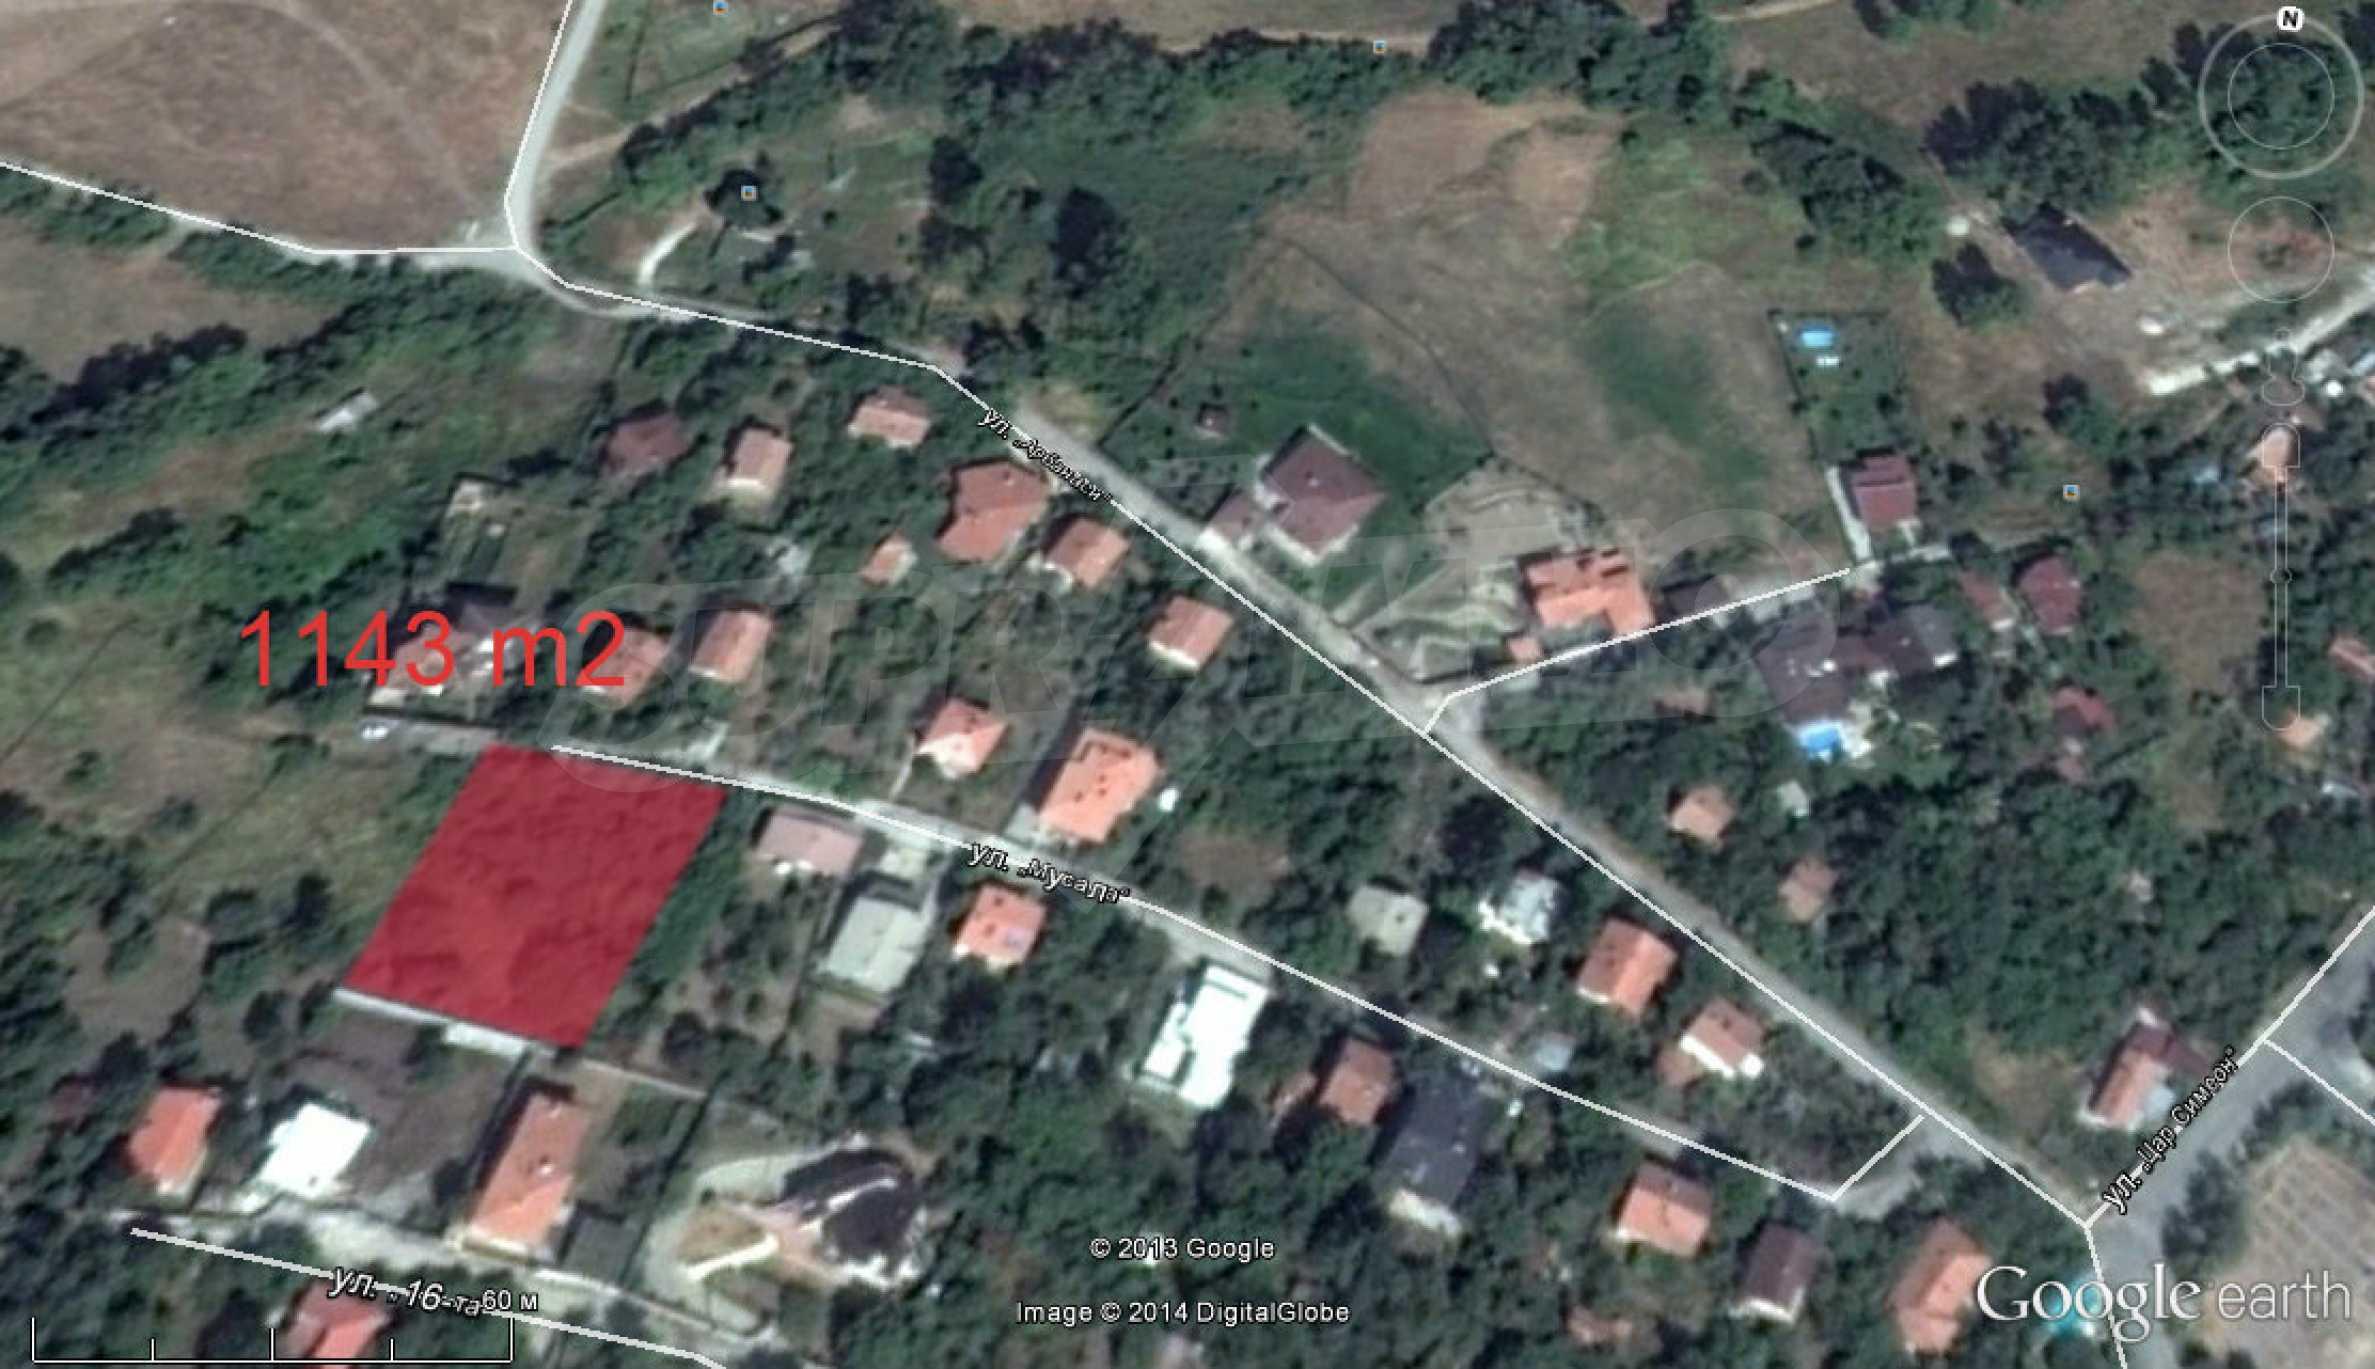 Baugrundstück zu verkaufen im Stadtteil Gradoman